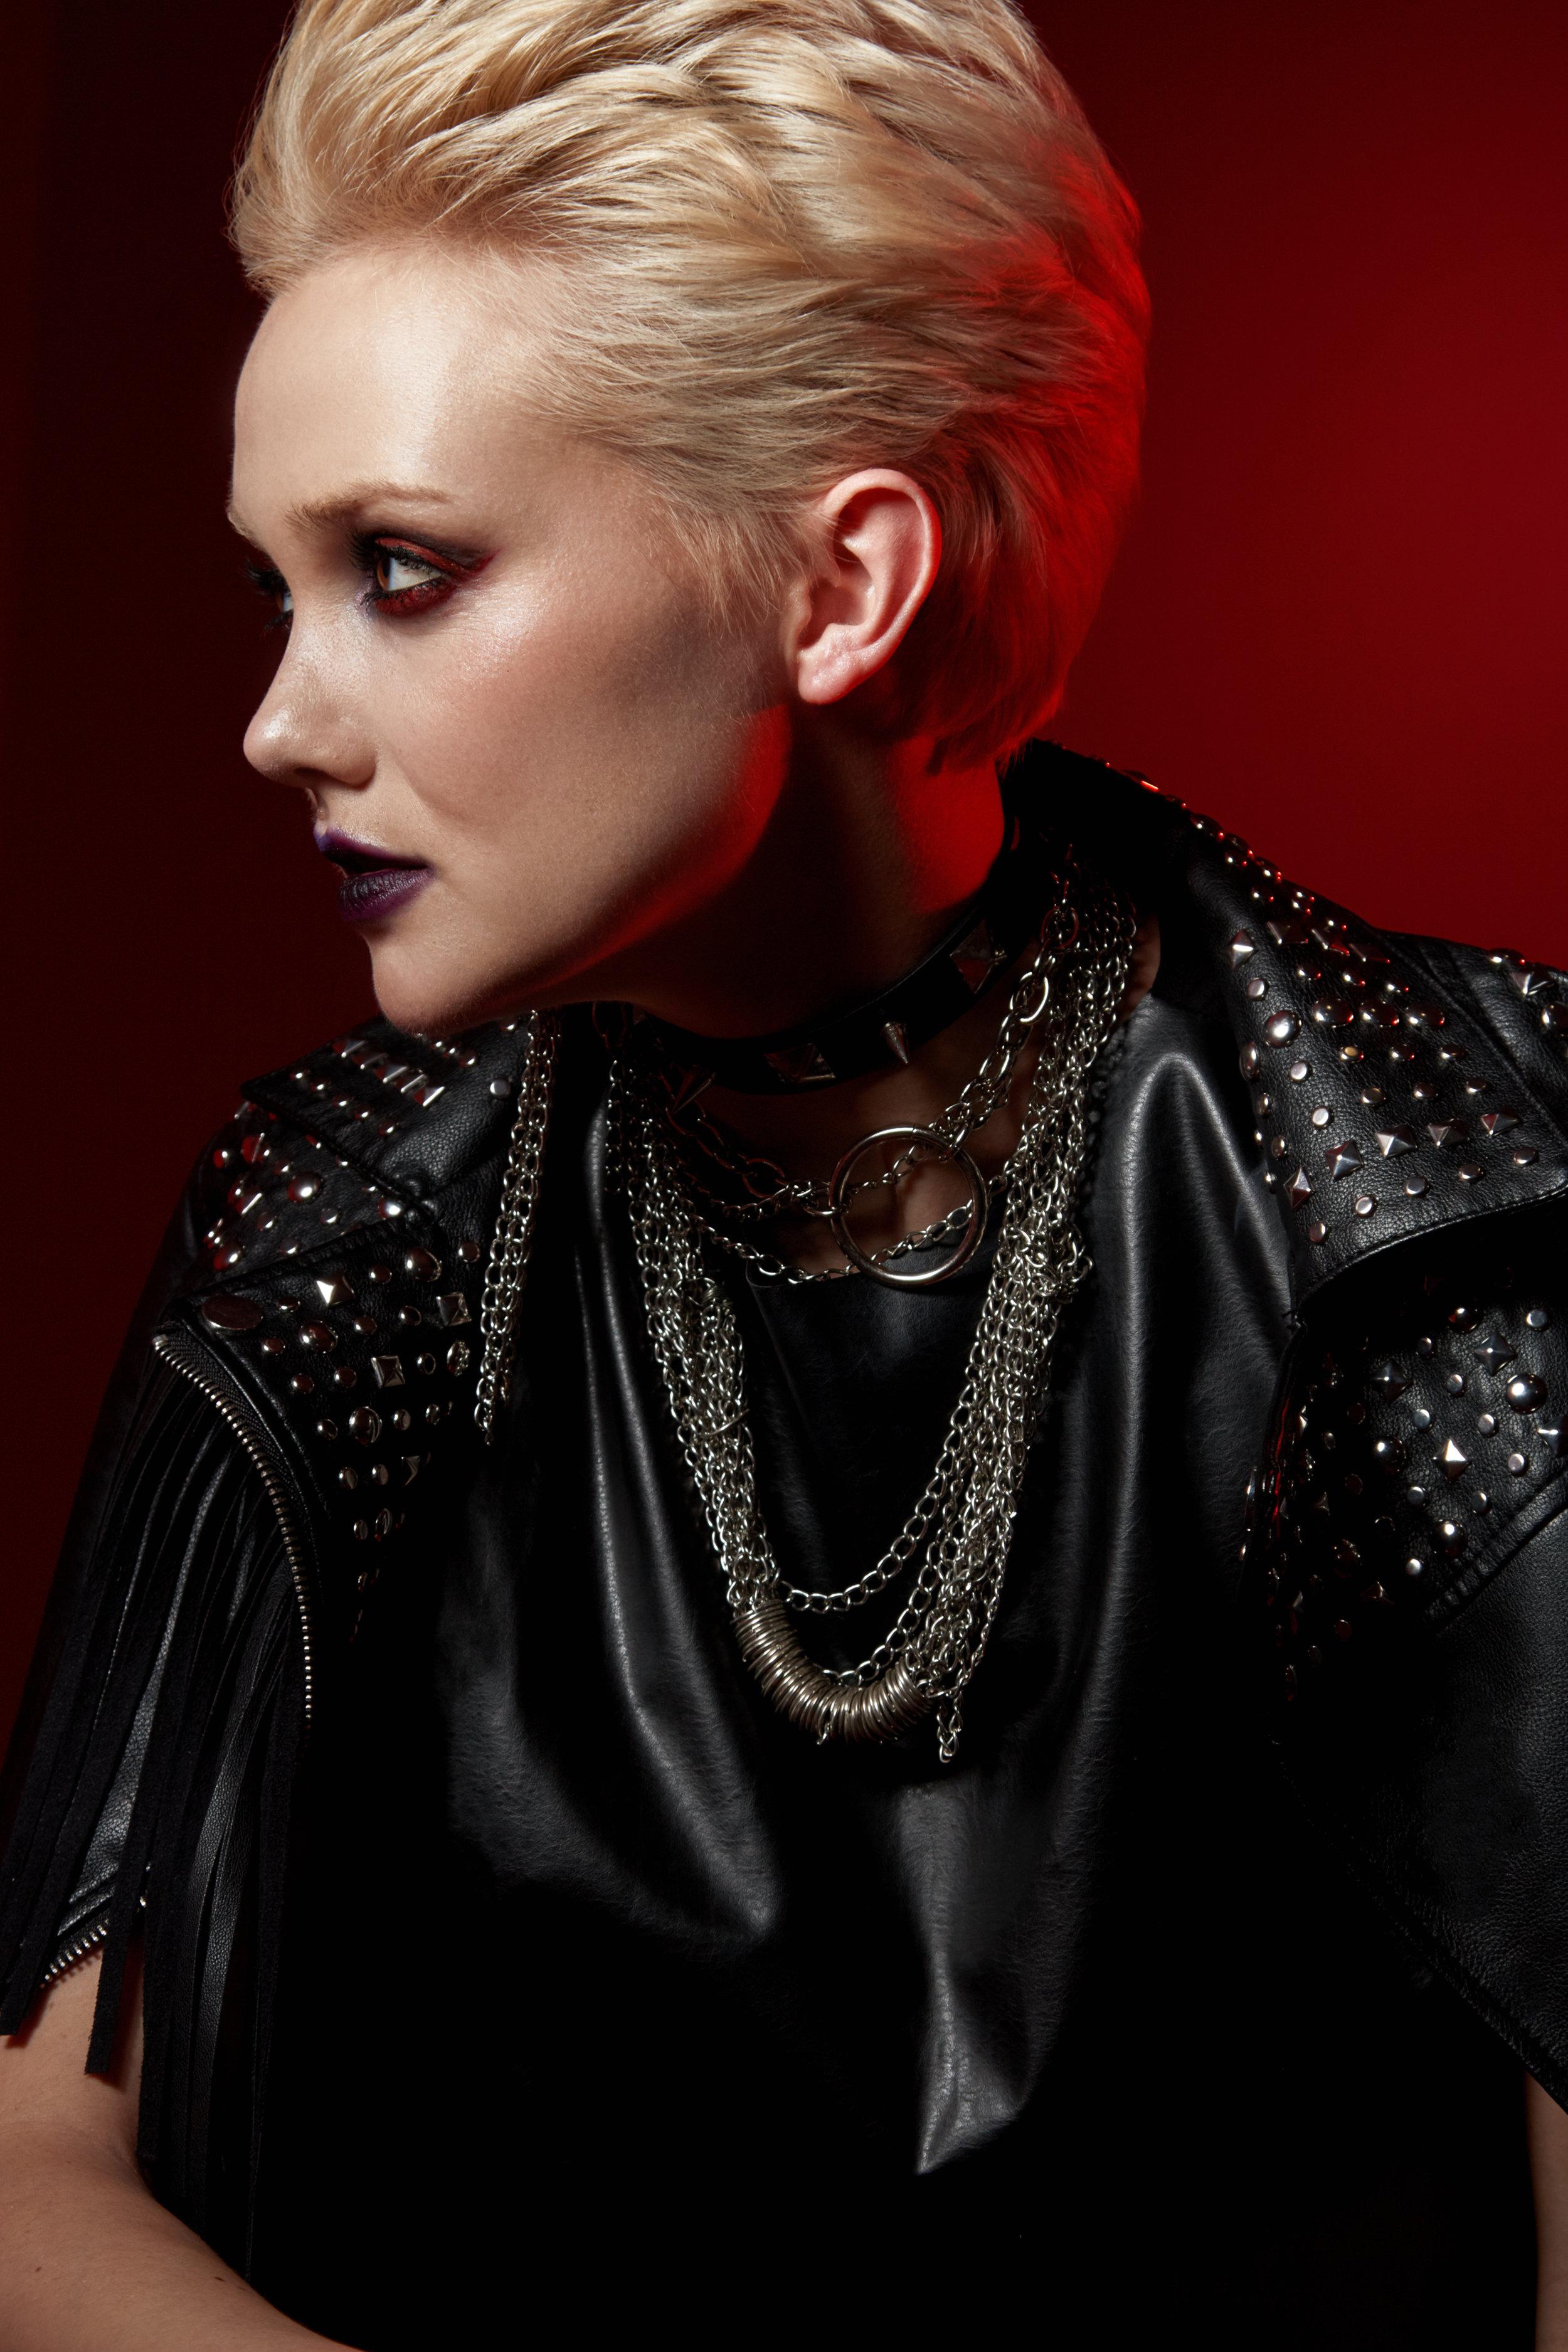 Leather jacket - Nadezda Sizova Jacket, Chains - Stylist property